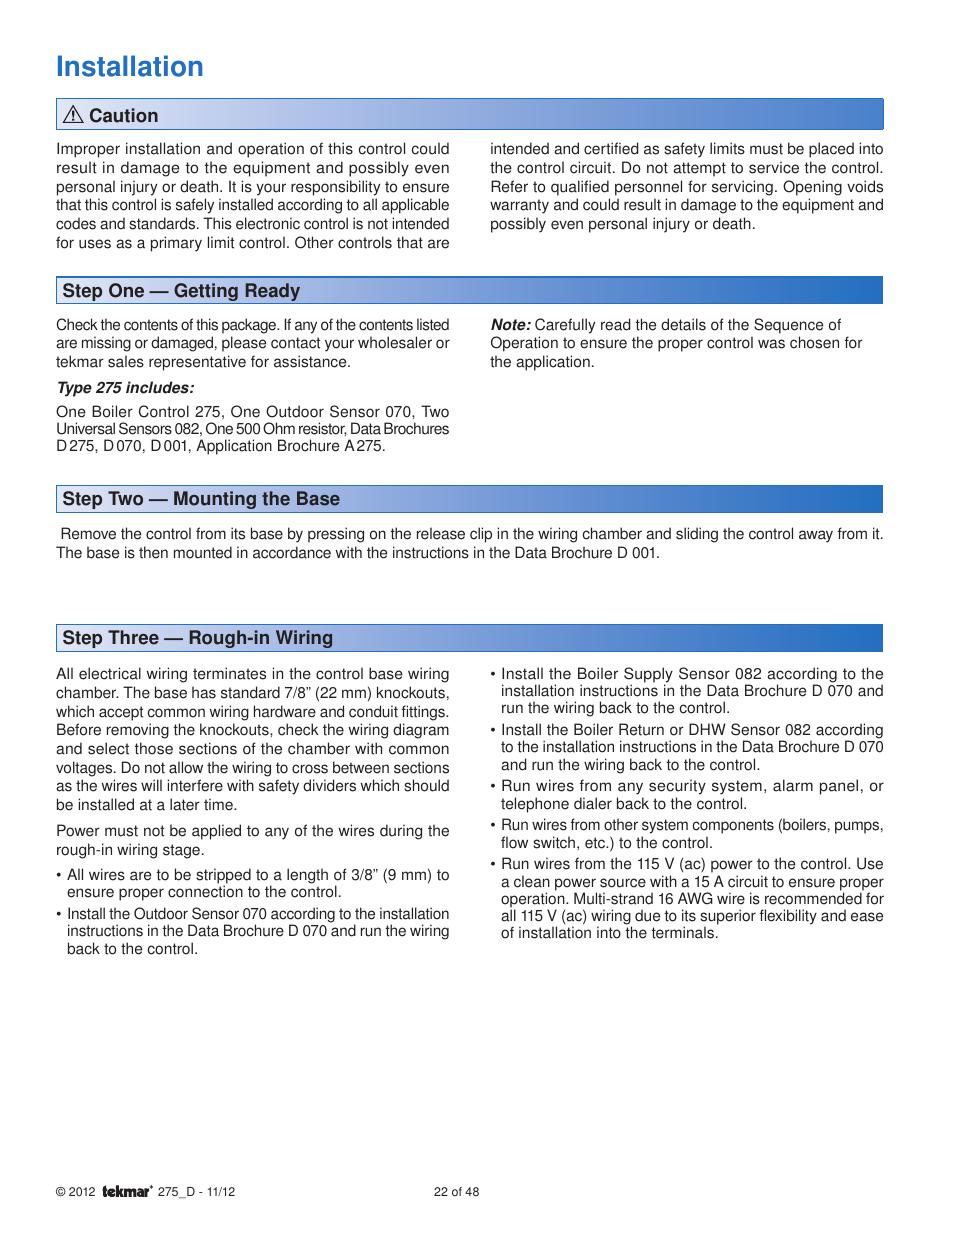 Installation Tekmar 275 Boiler Control User Manual Page 22 48 Controls Wiring Diagrams